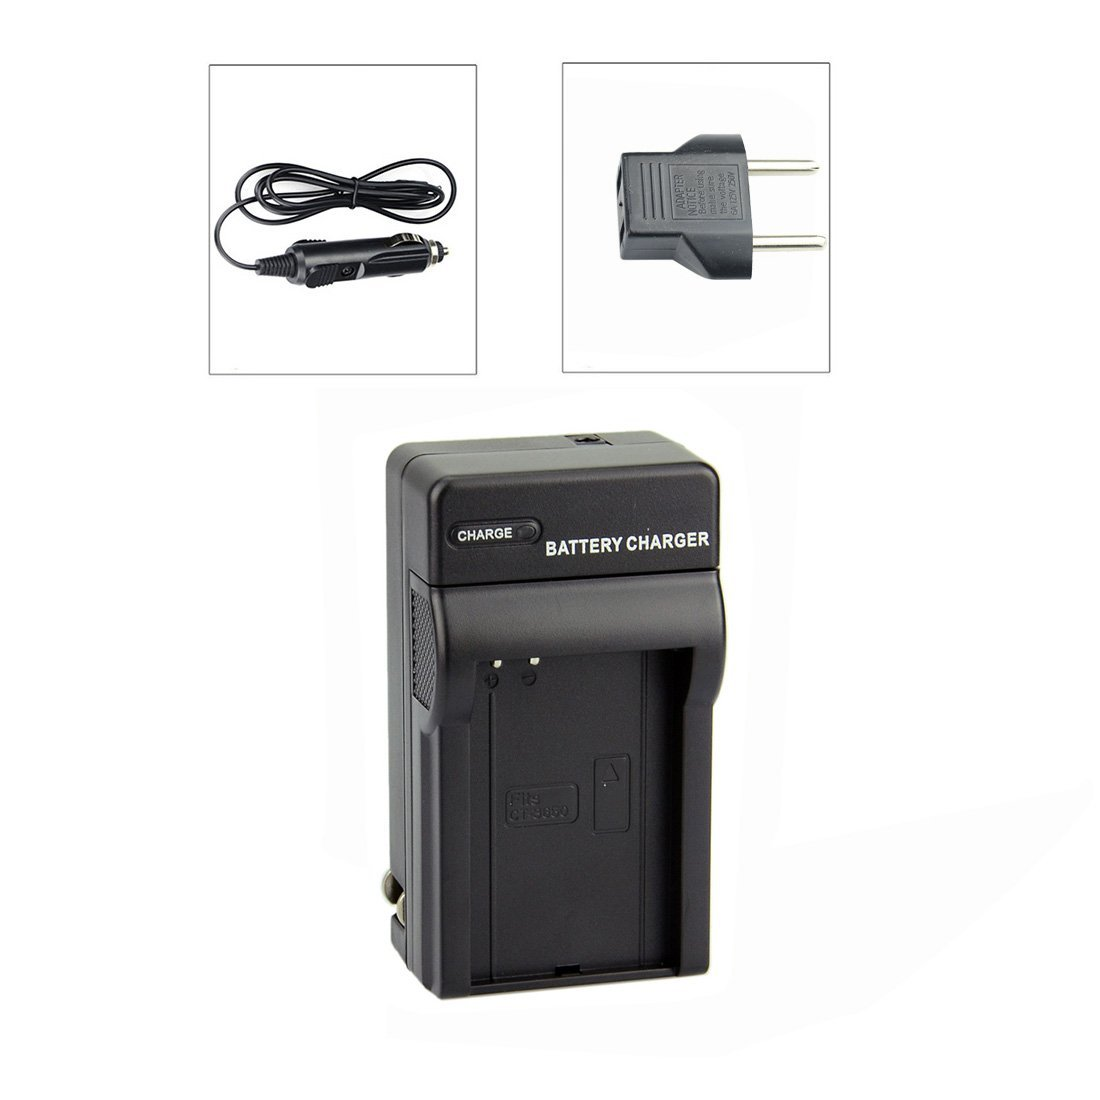 DSTE® CT-3650 DC128 Travel Charger Kit for VholdR ContourHD VholdR ContourGPS VholdR Contour2+ Digital Camera Battery